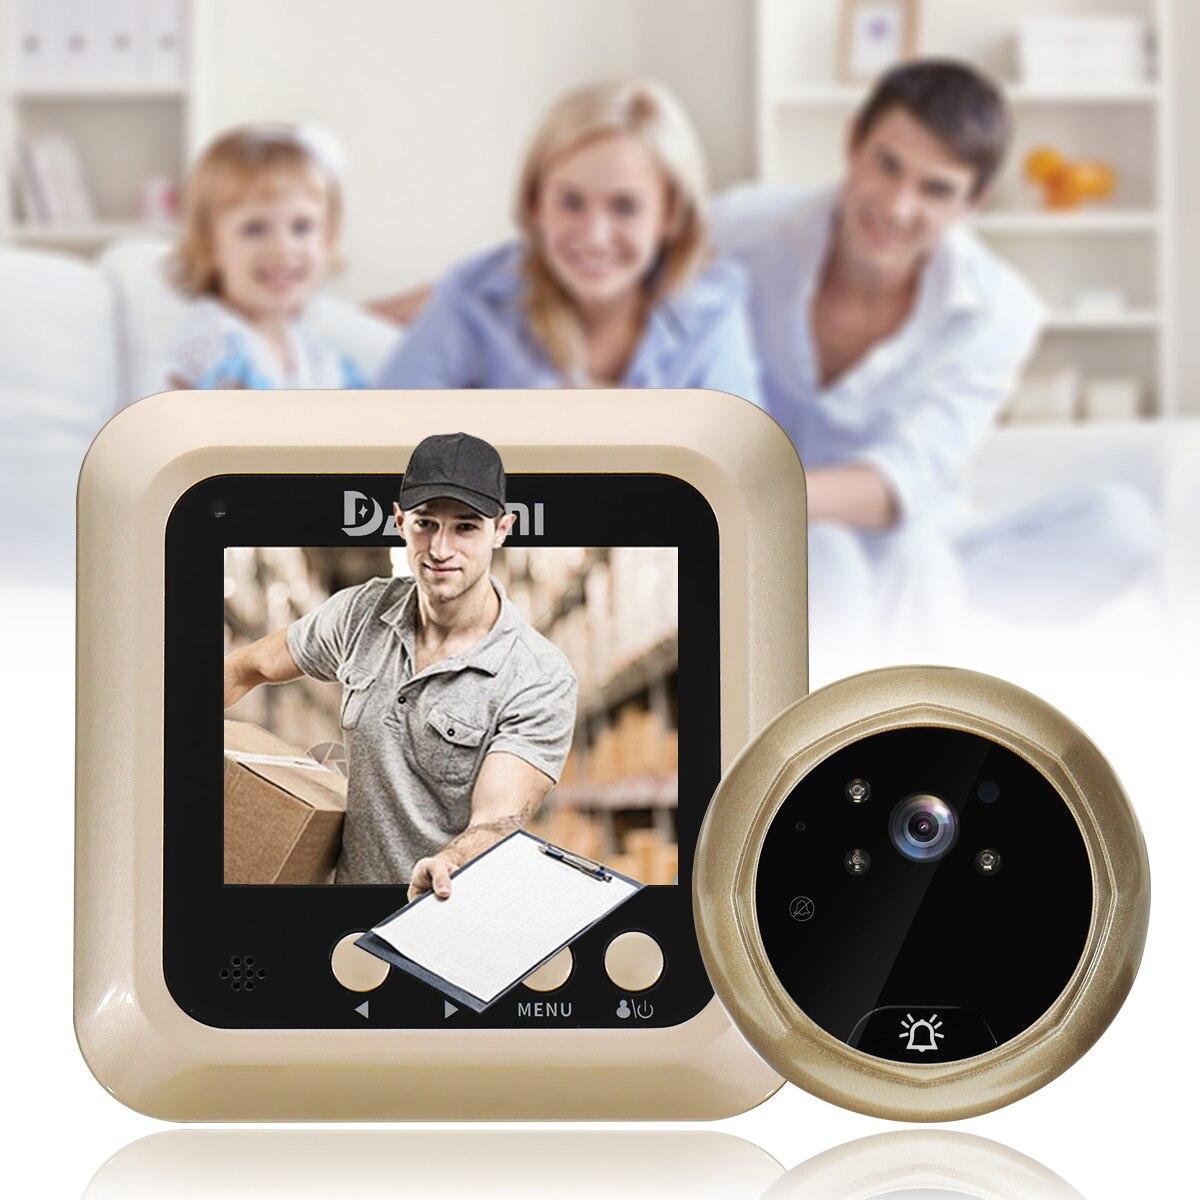 security door bell wireless doorbell video camera pir night vision intercom home hd screen. Black Bedroom Furniture Sets. Home Design Ideas